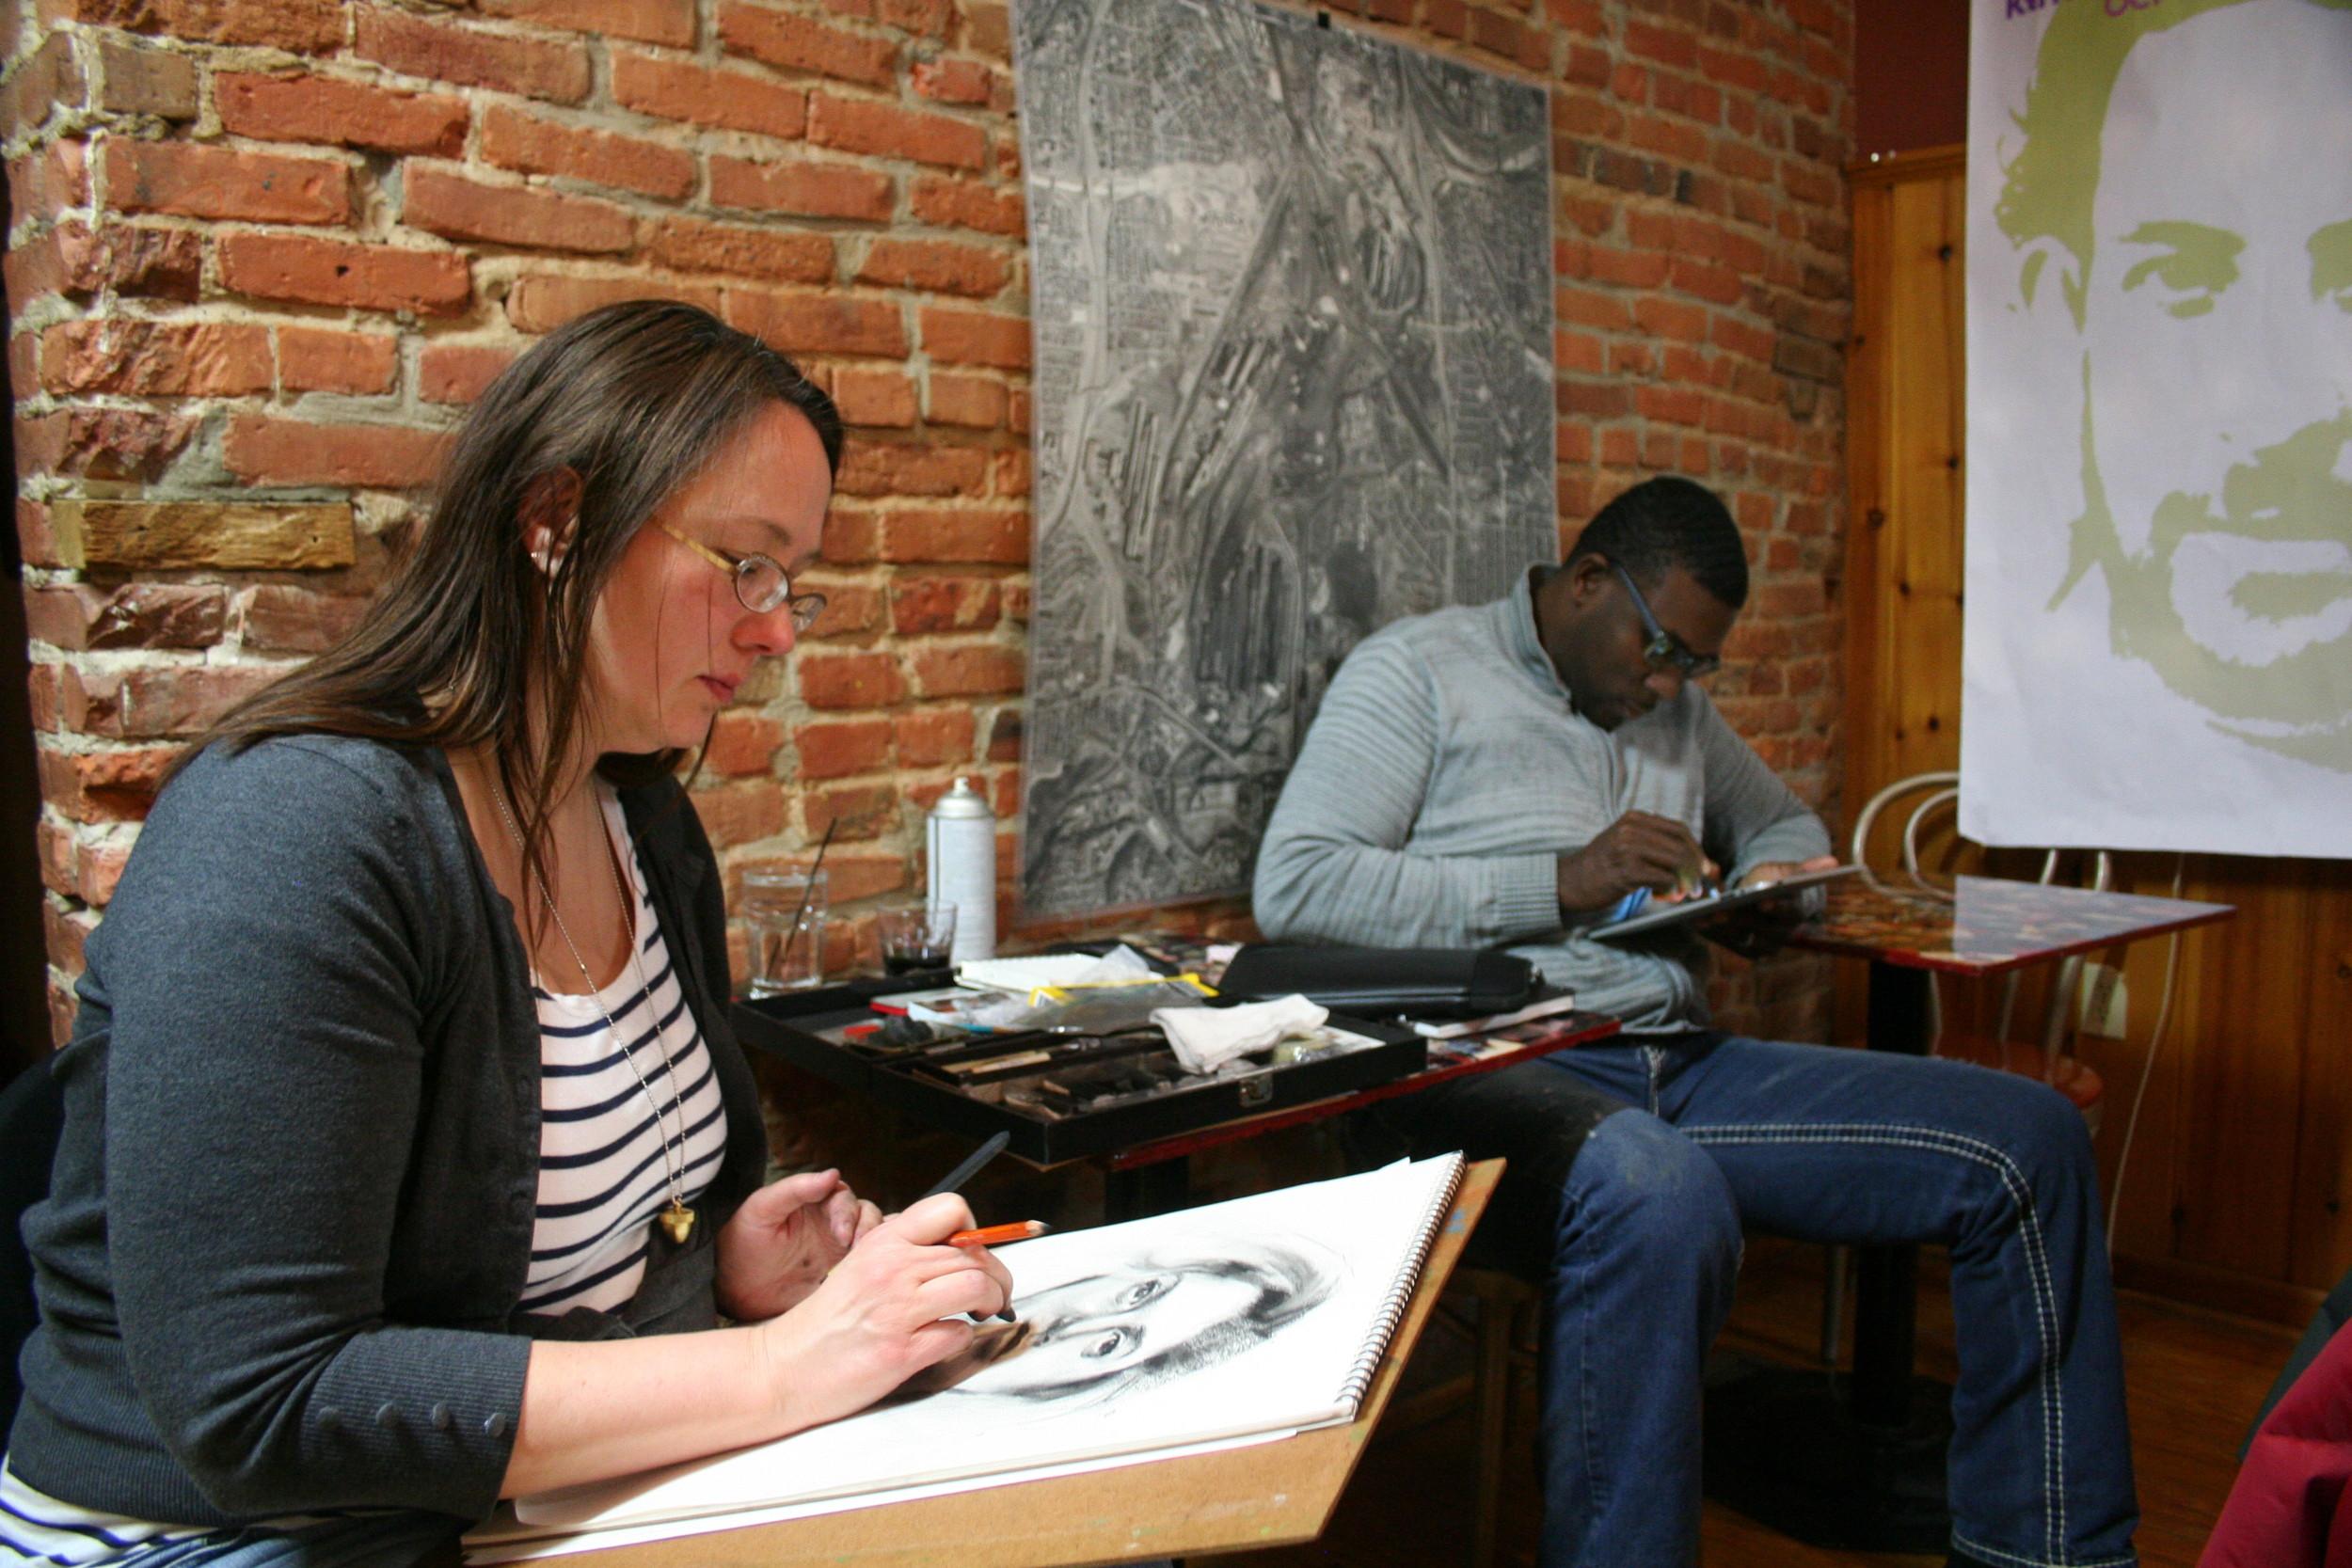 Kathryn Heim and Gus Turner working of their portraits of Ina Basho